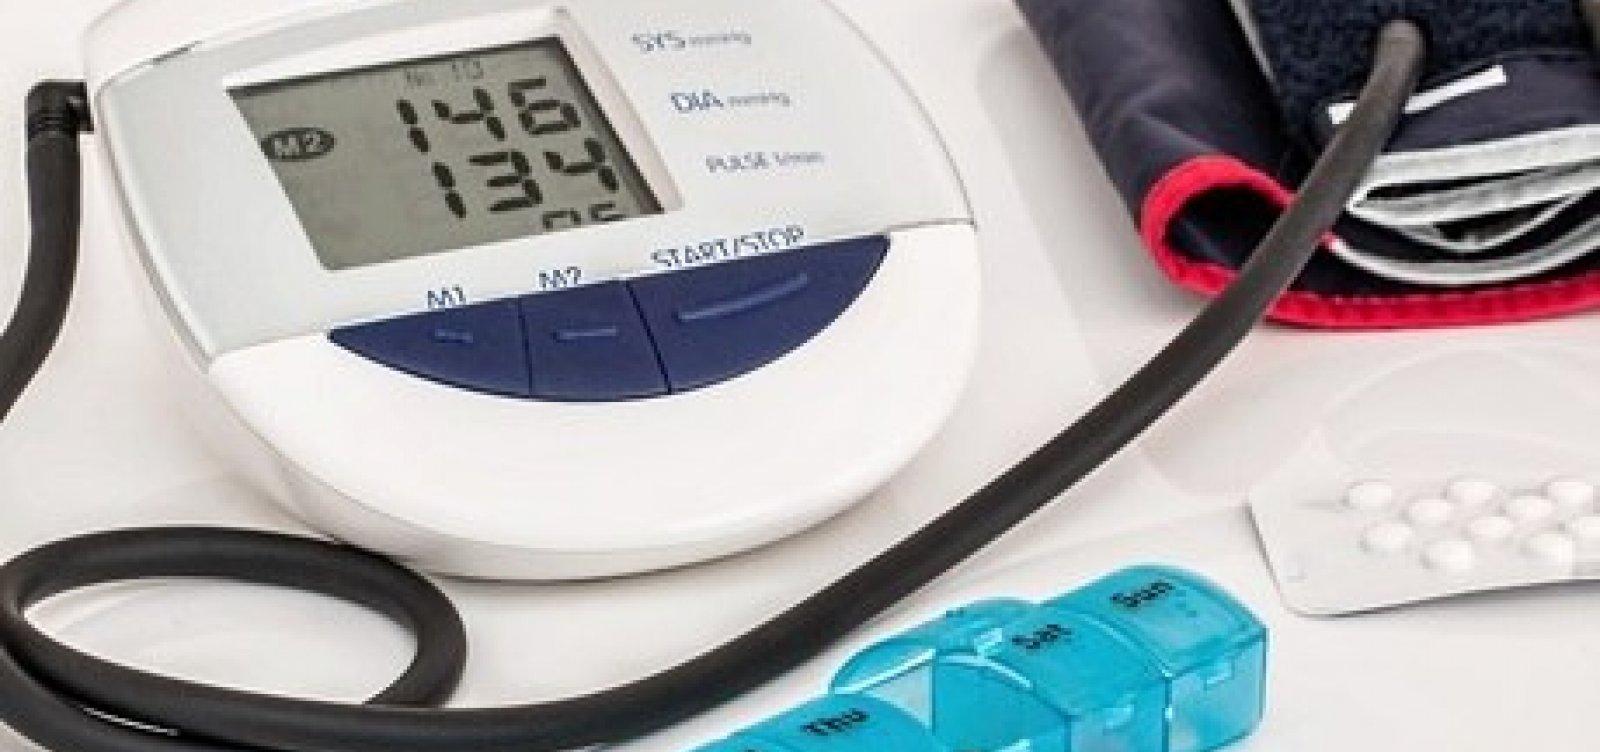 [ANS suspende vendas de 56 planos de saúde de 12 operadoras]